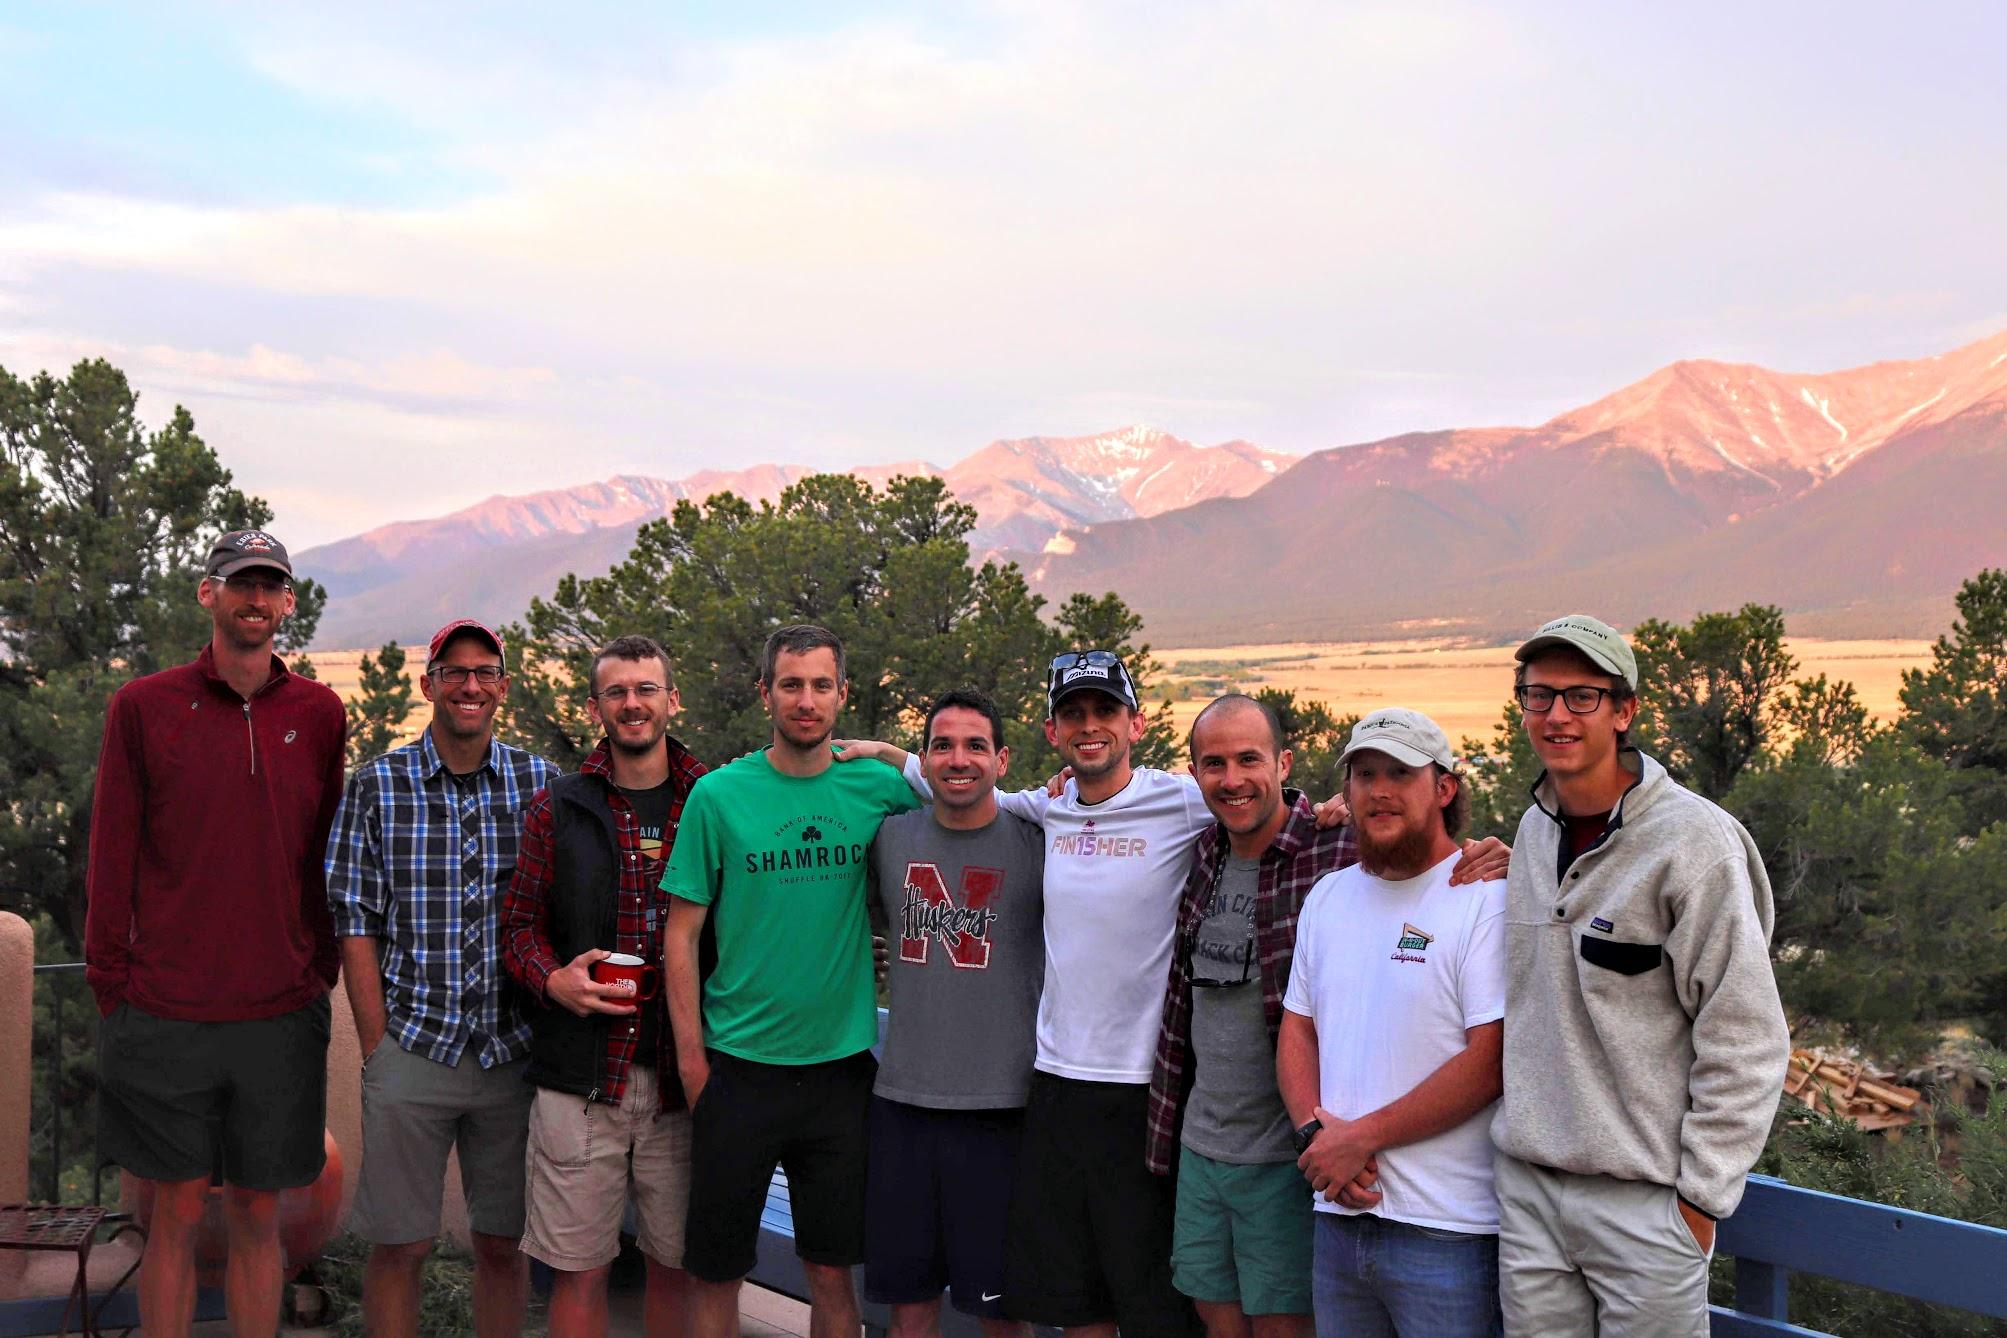 Some of the original LRC members.